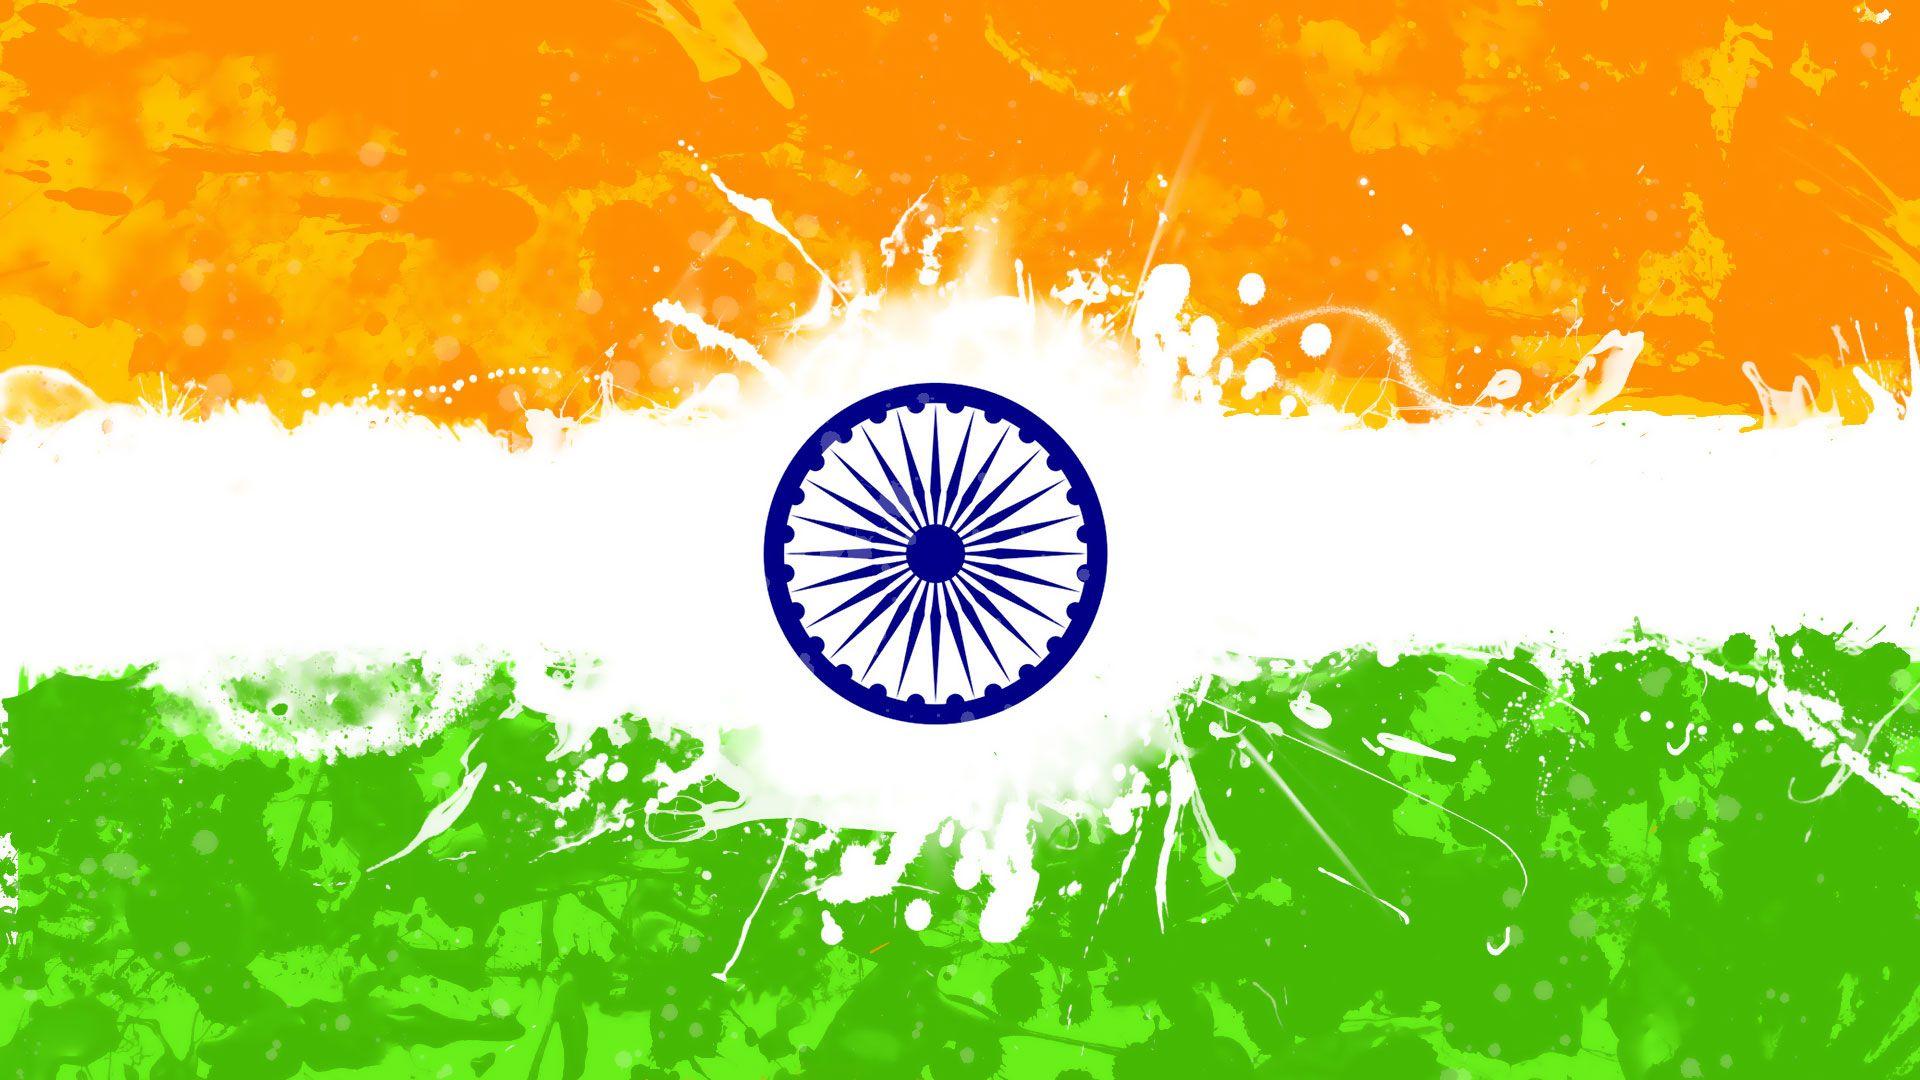 I Love My India | Nationality | Pinterest